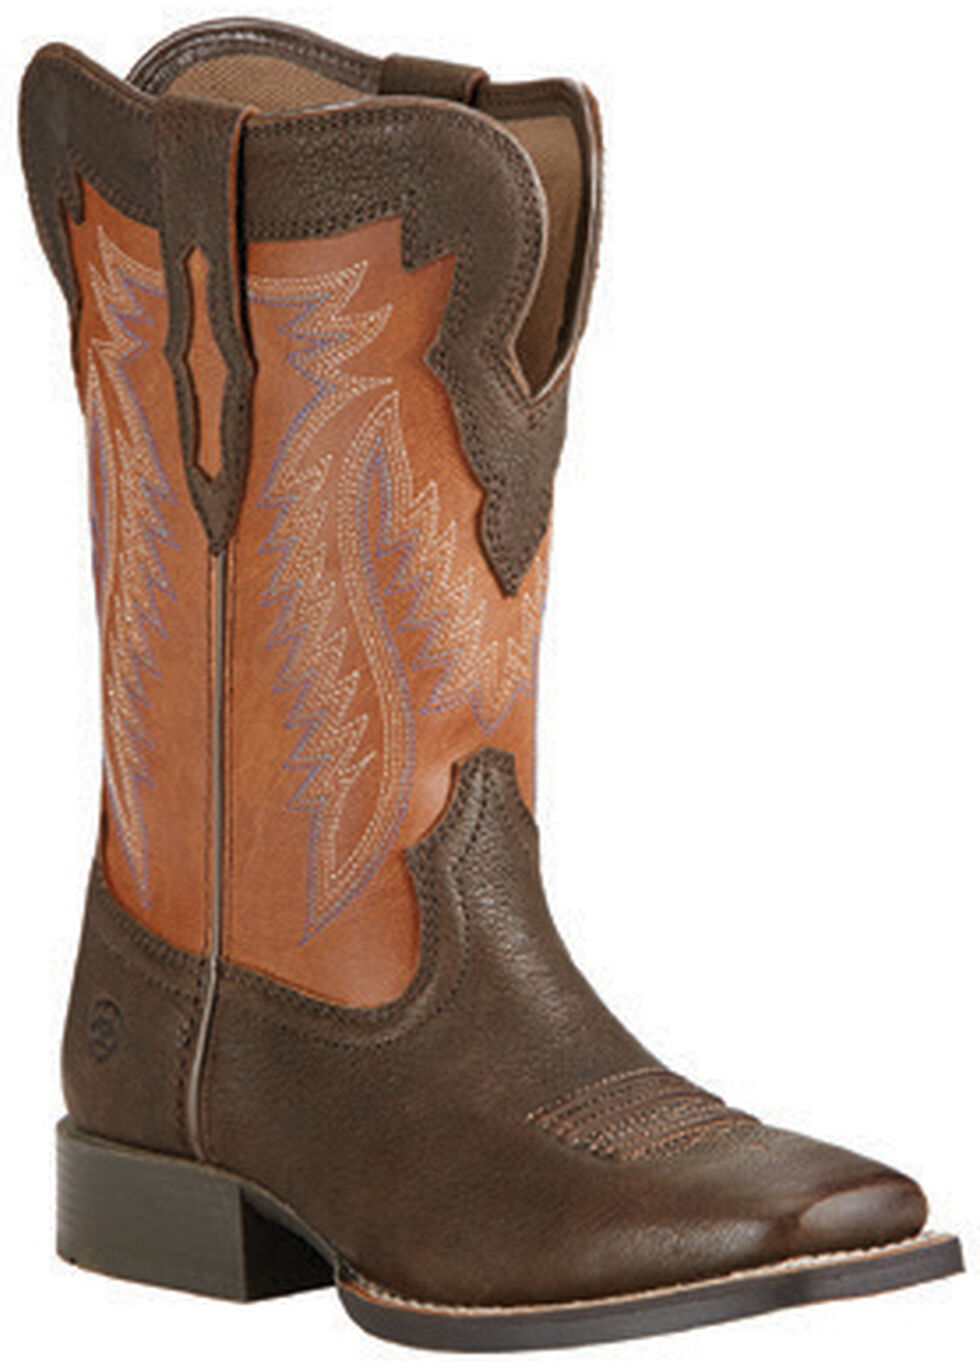 Ariat Boys' Buscadero Cowboy Boots - Square Toe, Brown, hi-res